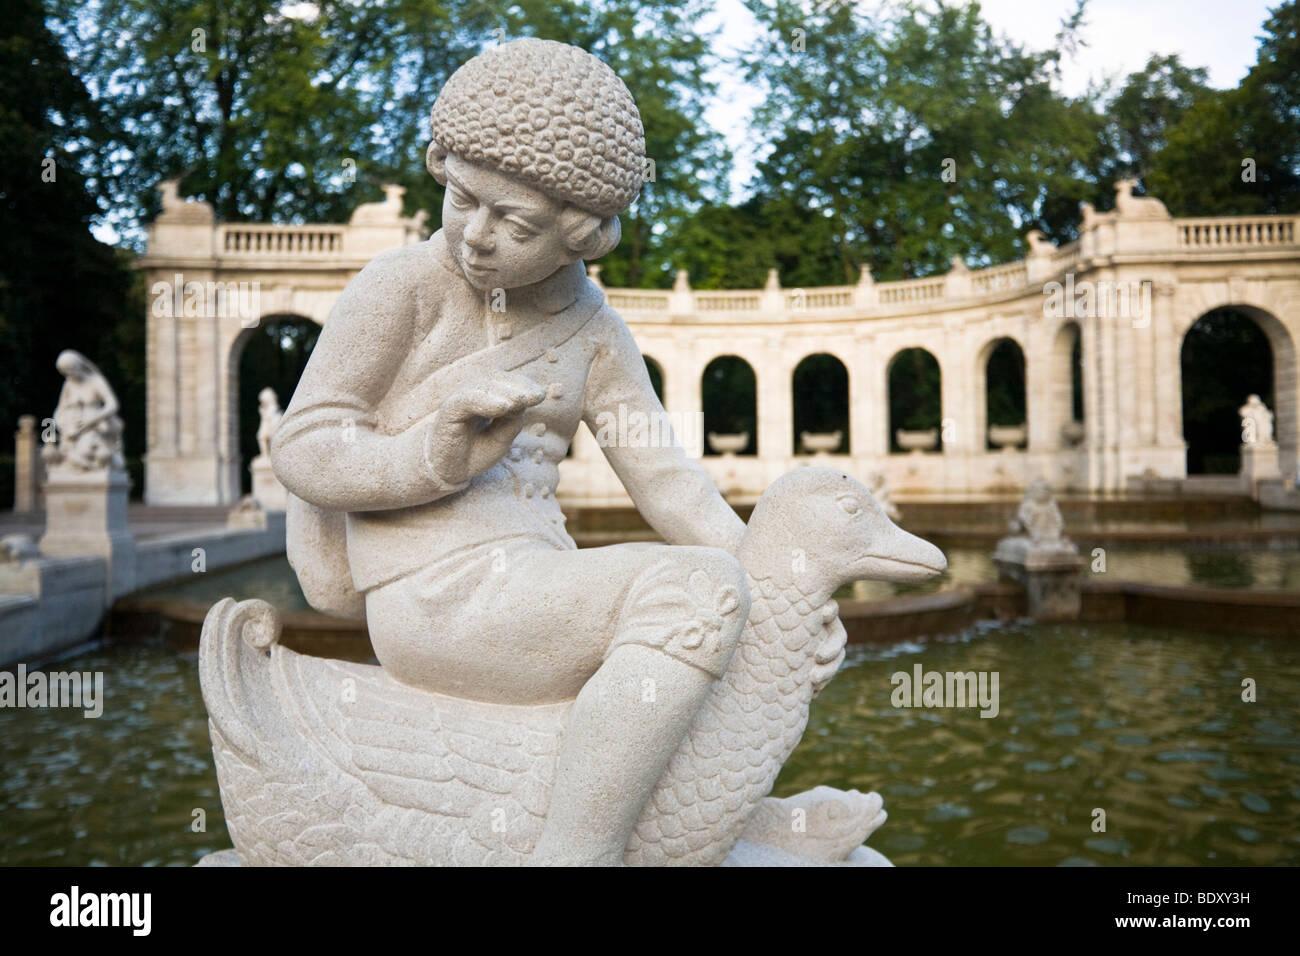 Hansel from Hansel and Gretel, fairytale fountain, Volkspark am Friedrichshain, Friedrichshain, Berlin, Germany, - Stock Image